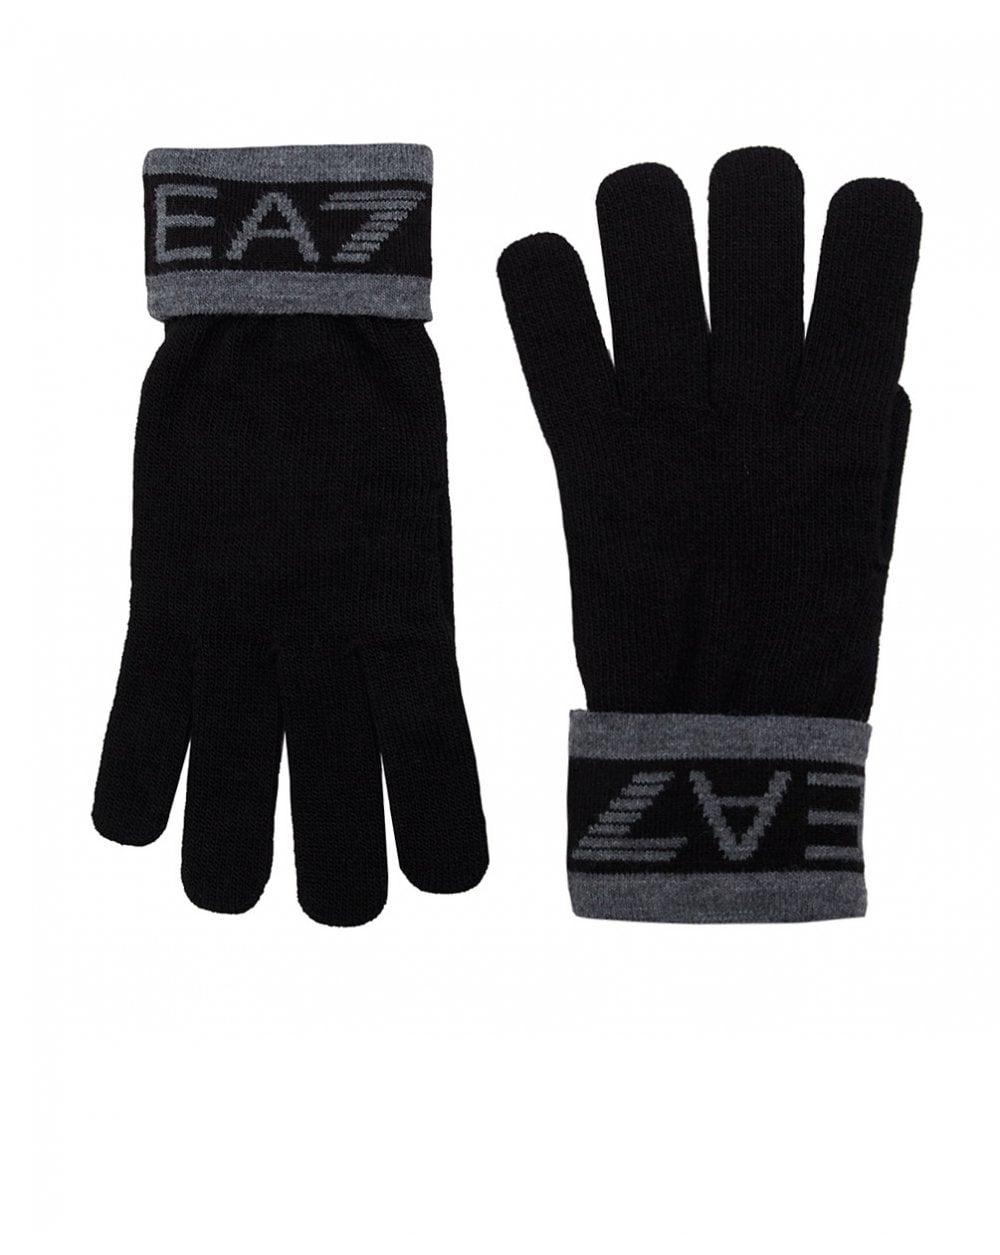 Armani Gloves (Black (L)/Khaki (M/L) - £27.49 at Psyche (Quidco/TCB - 6.5% Back)